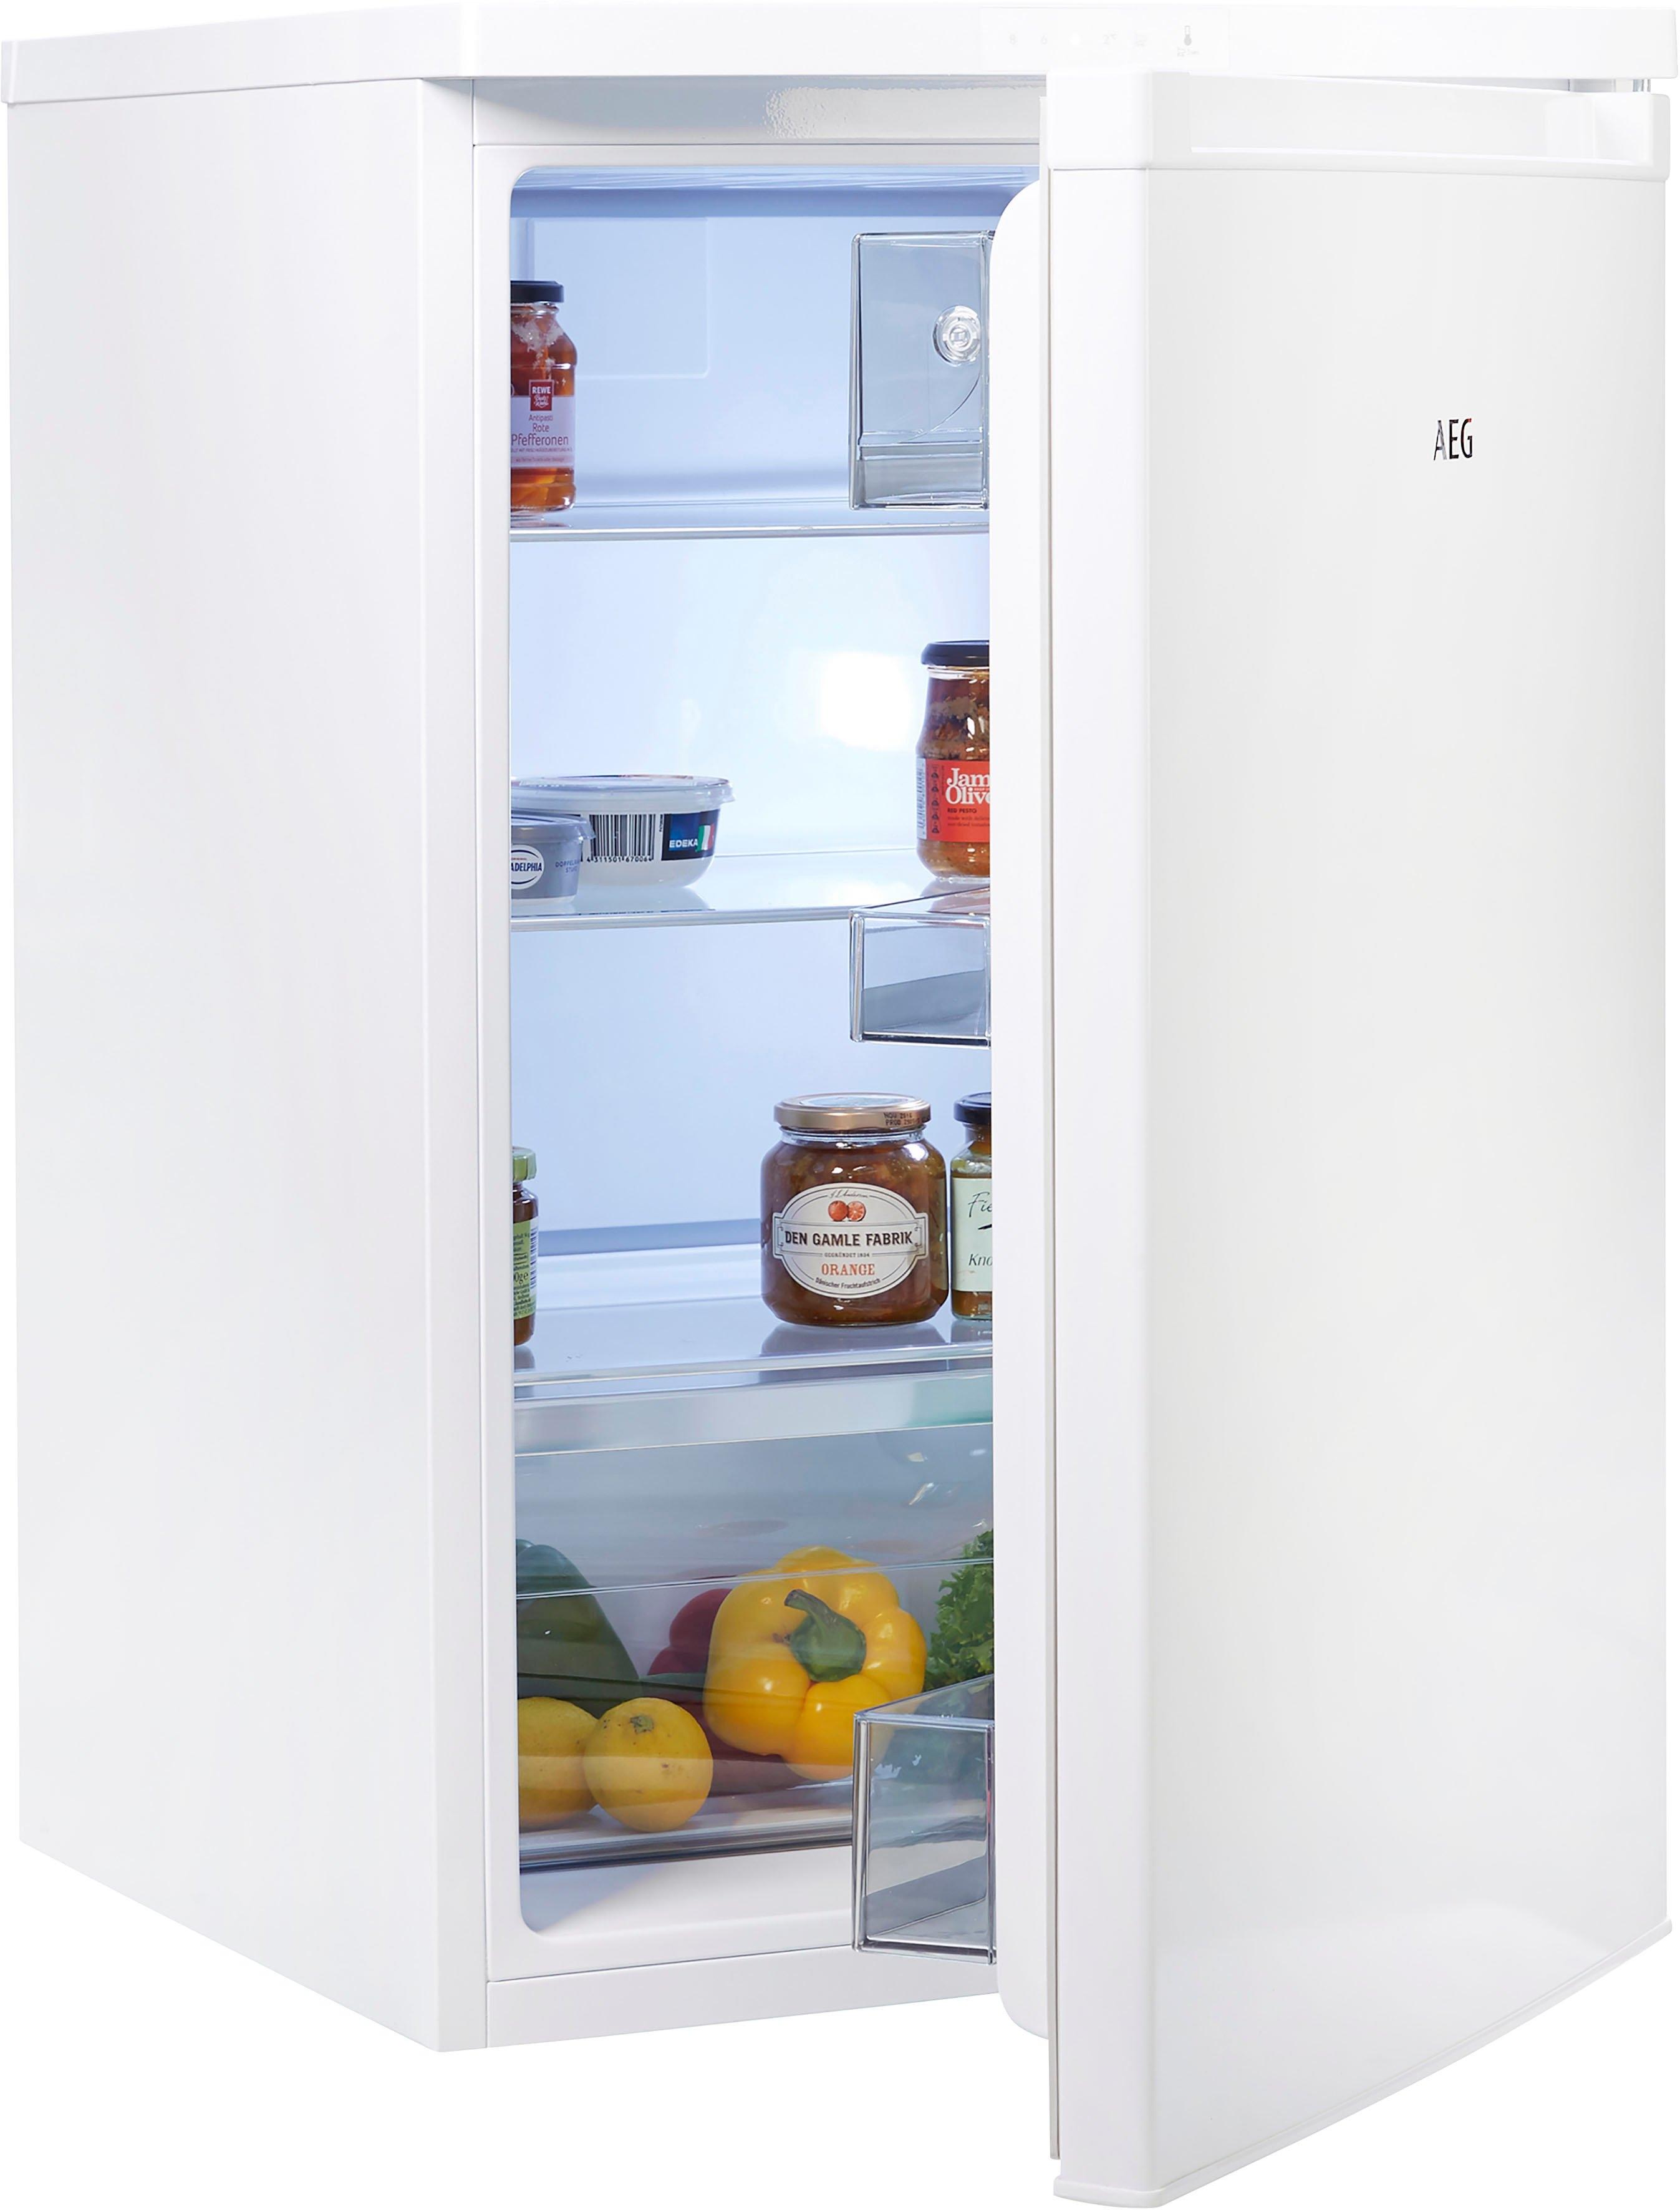 AEG »RTE814D1AW« koelkast online kopen op otto.nl